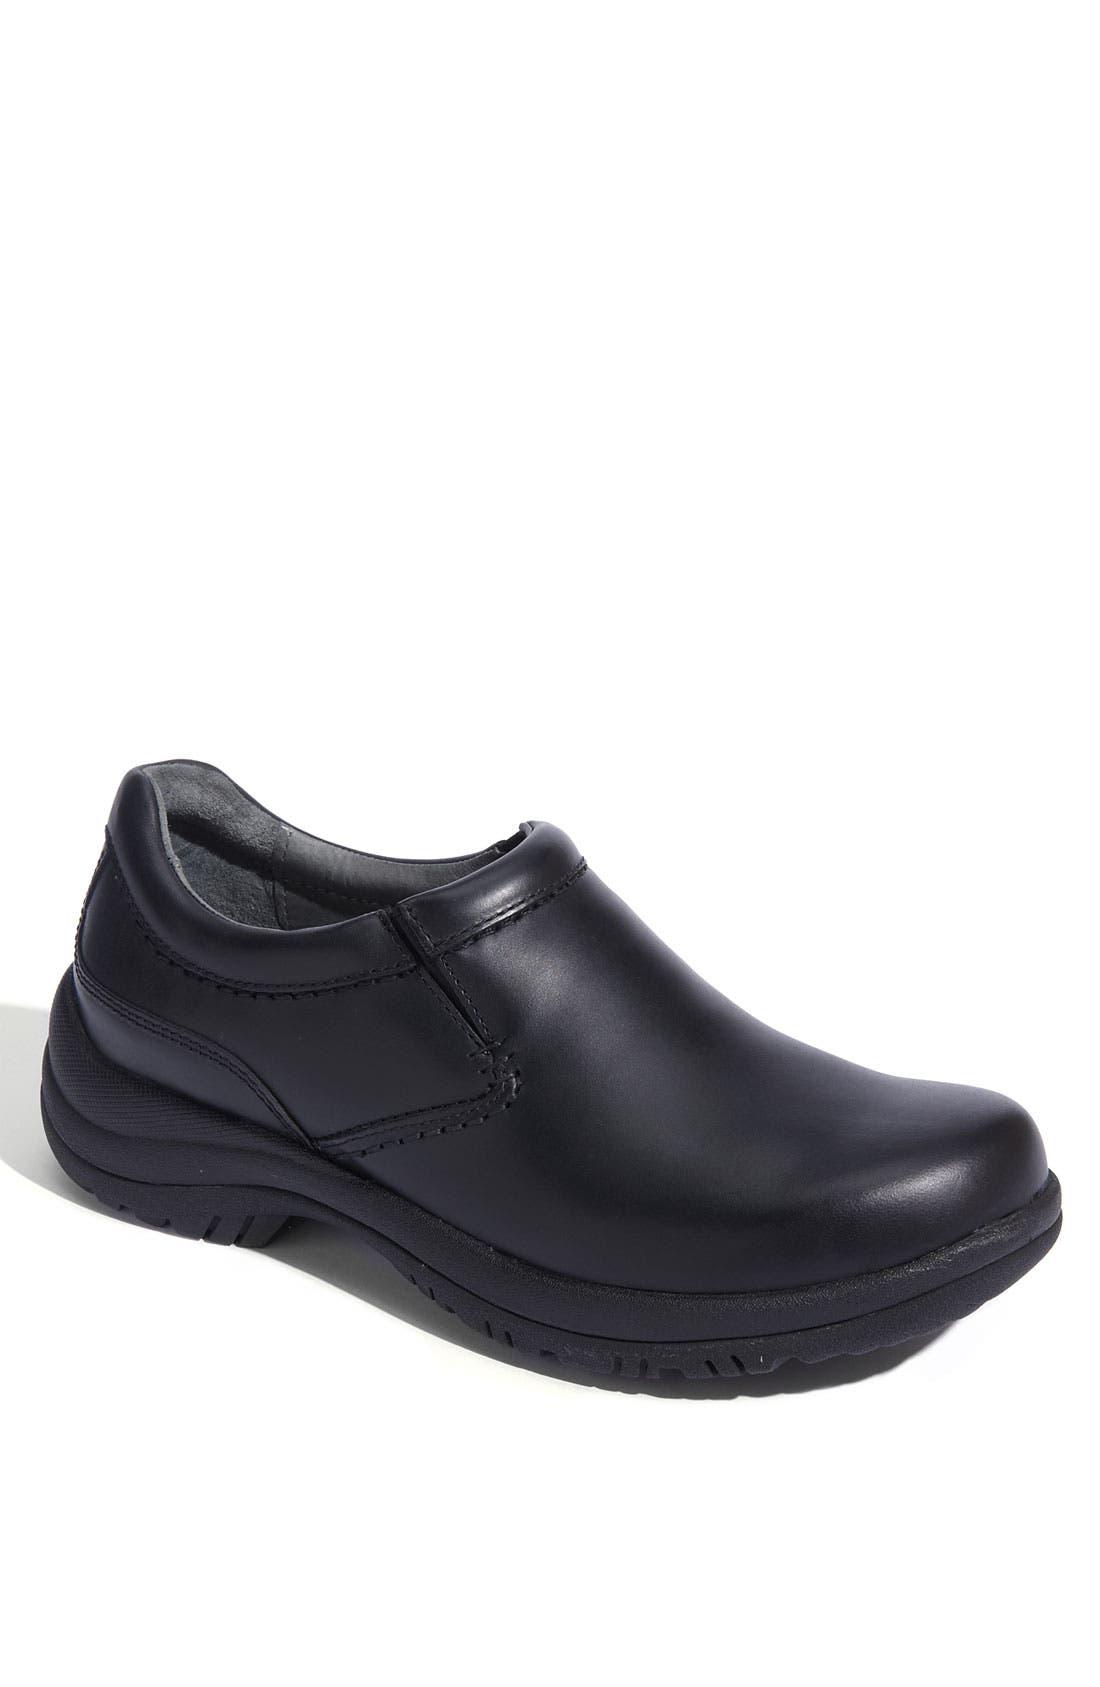 'Wynn' Slip-On,                         Main,                         color, BLACK